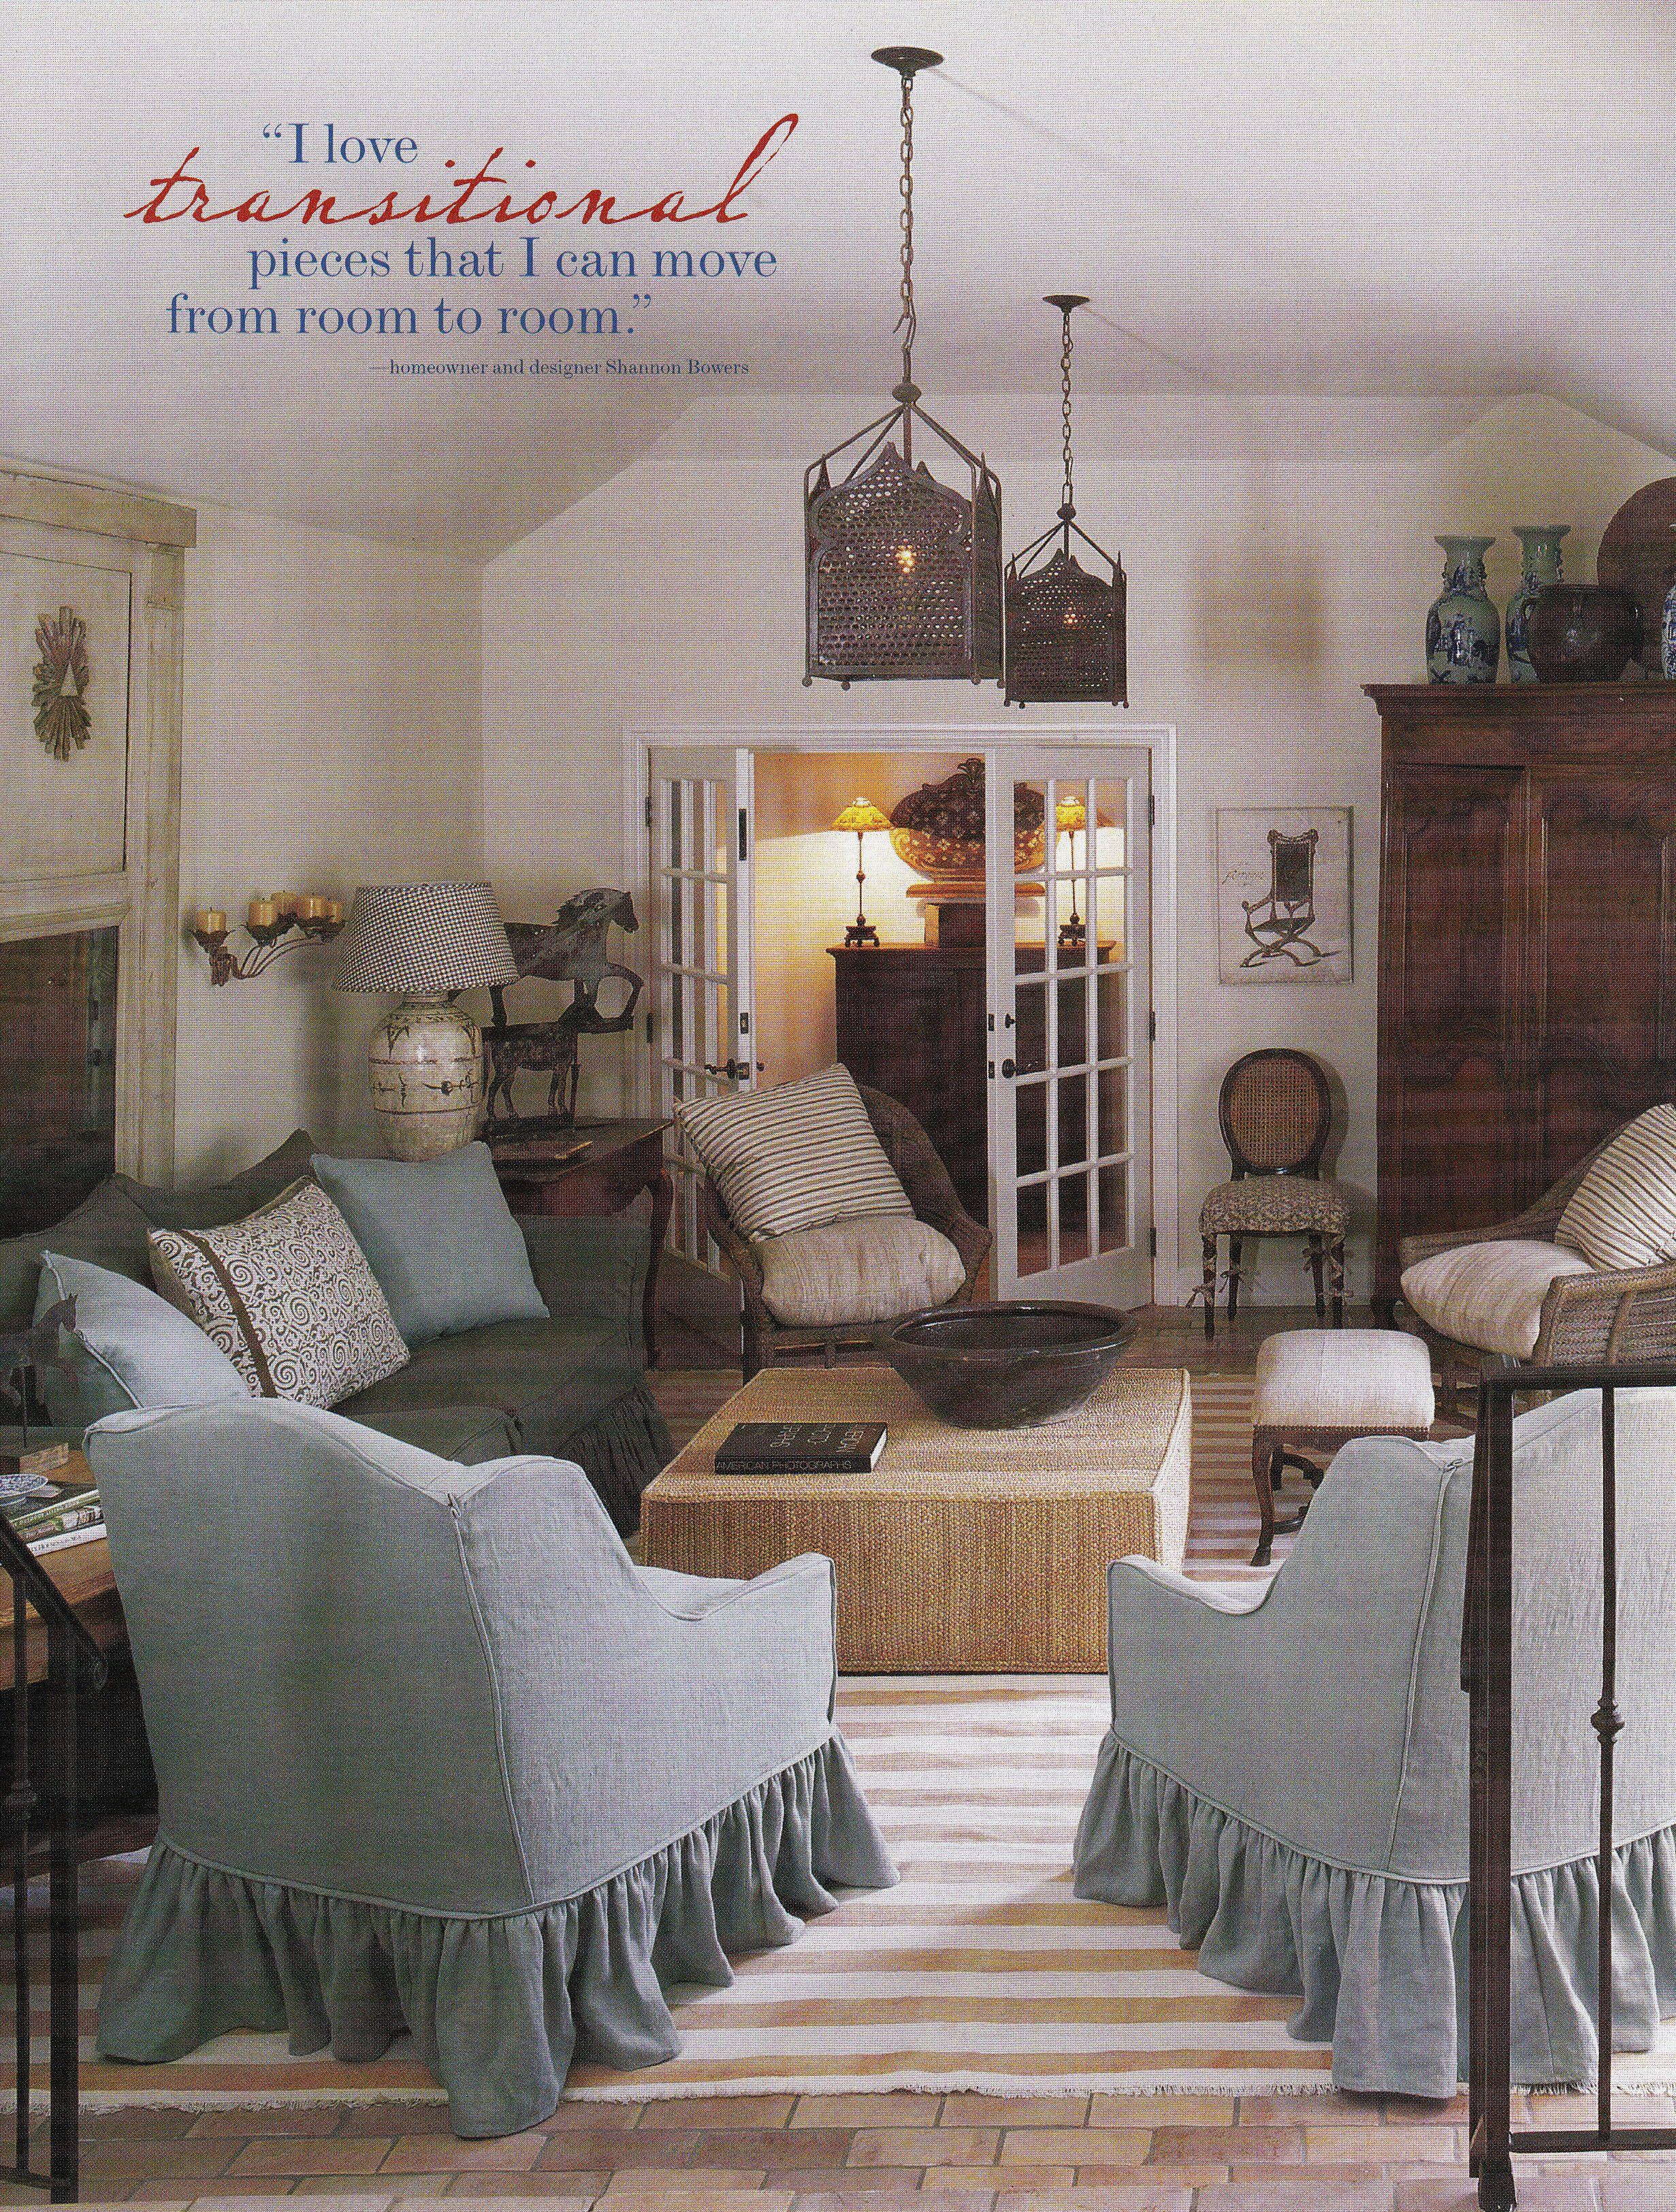 Interior Designer Shannon Bowers Dallas Home Modern Room House